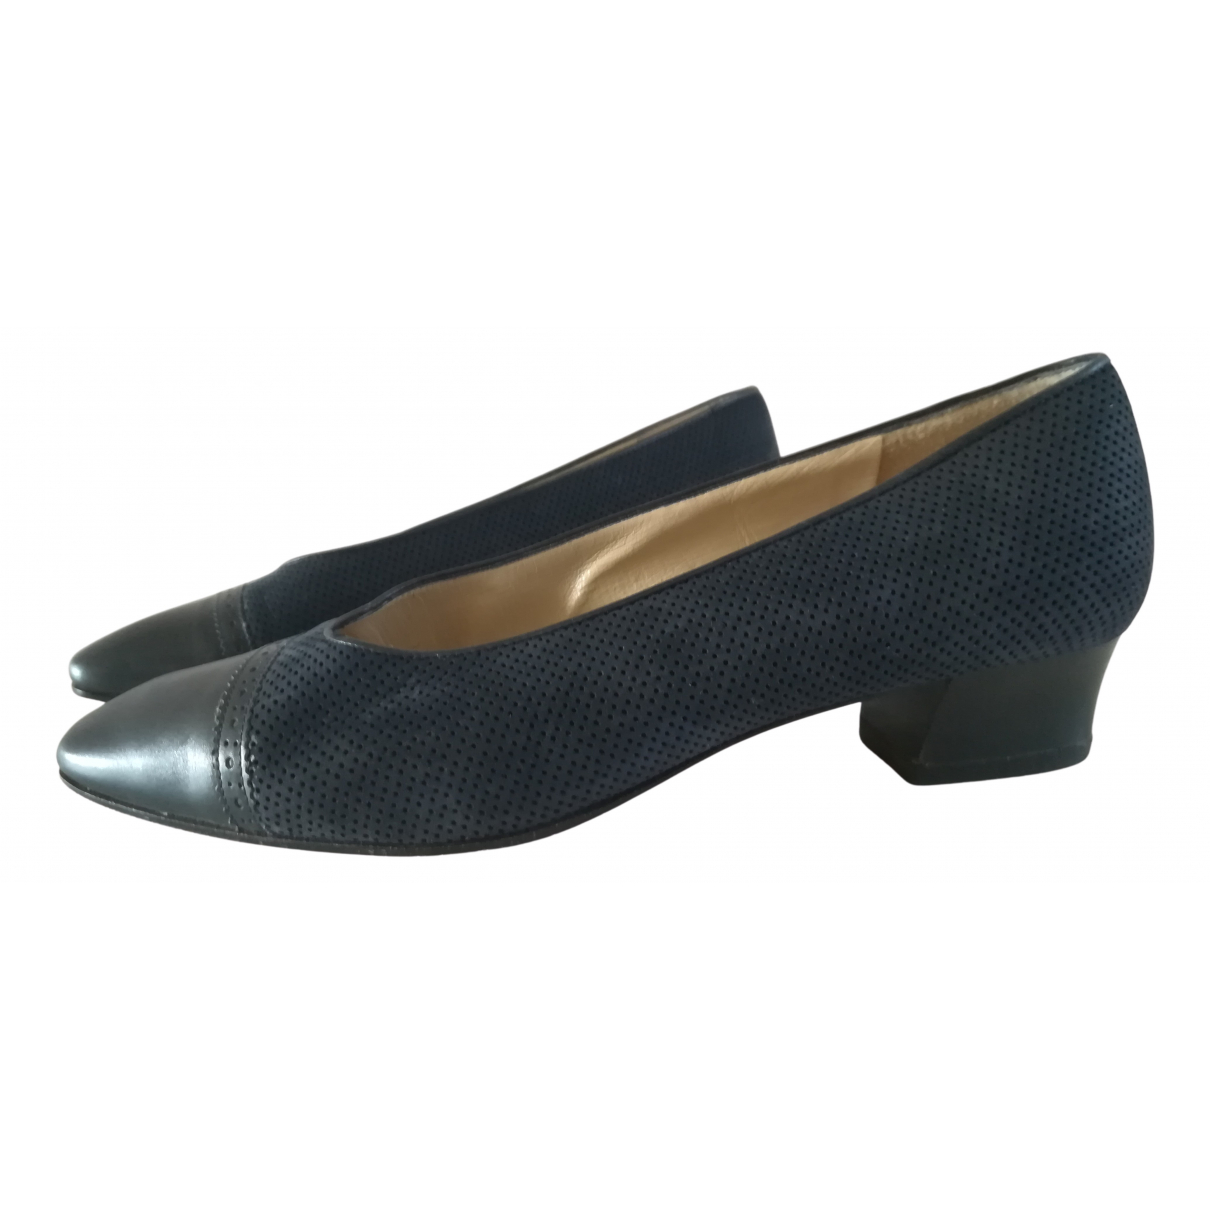 Bally N Navy Leather Heels for Women 37 EU